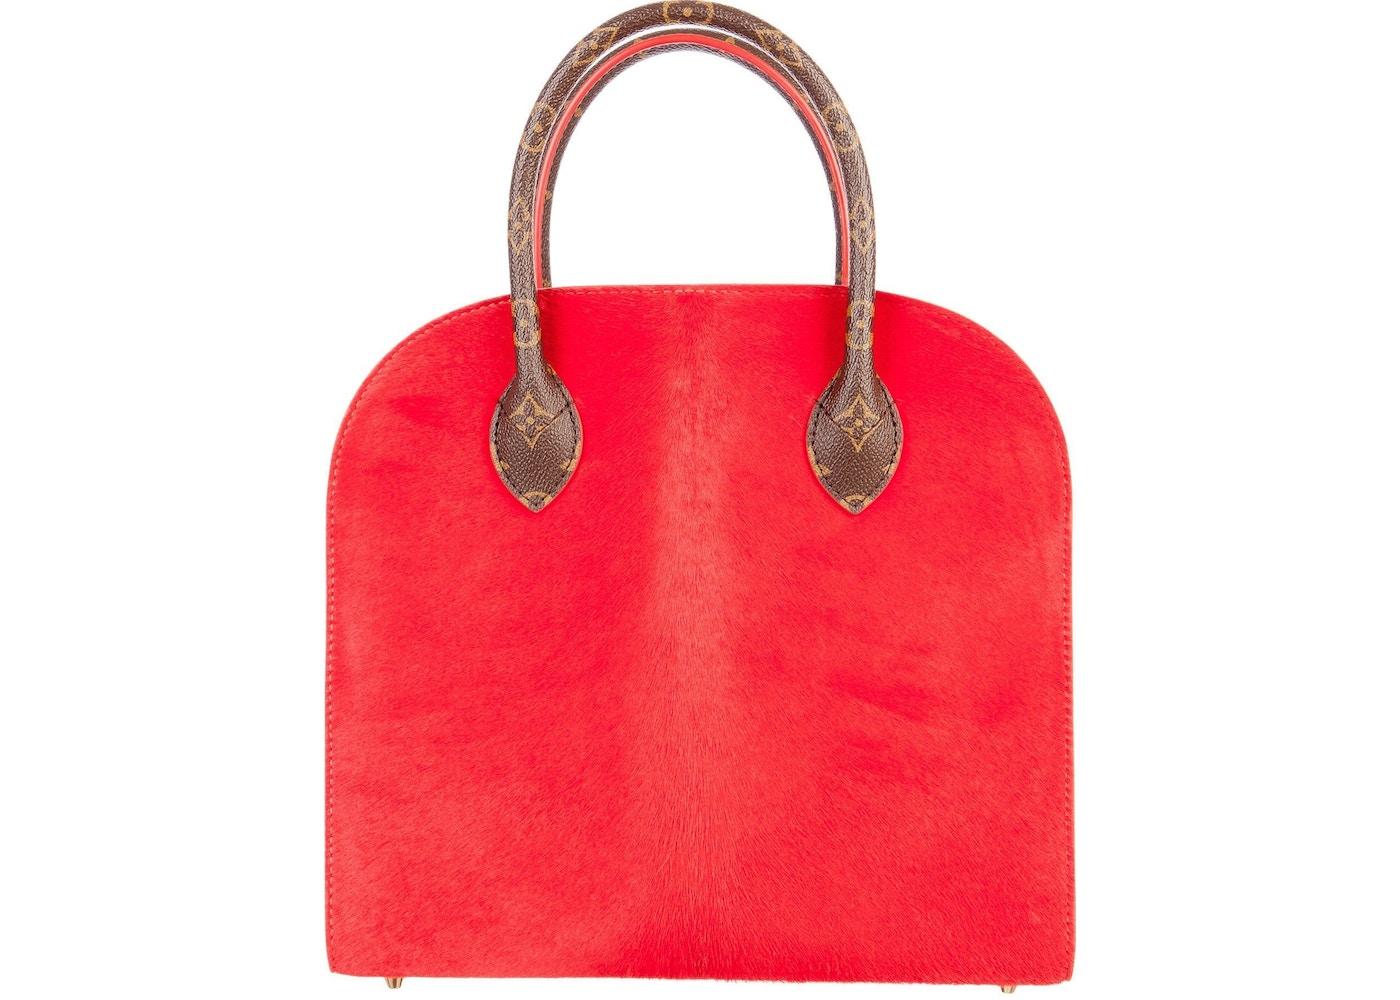 77378e751a21 Louis Vuitton x Christian Louboutin Iconoclast Tote Monogram Brown Red